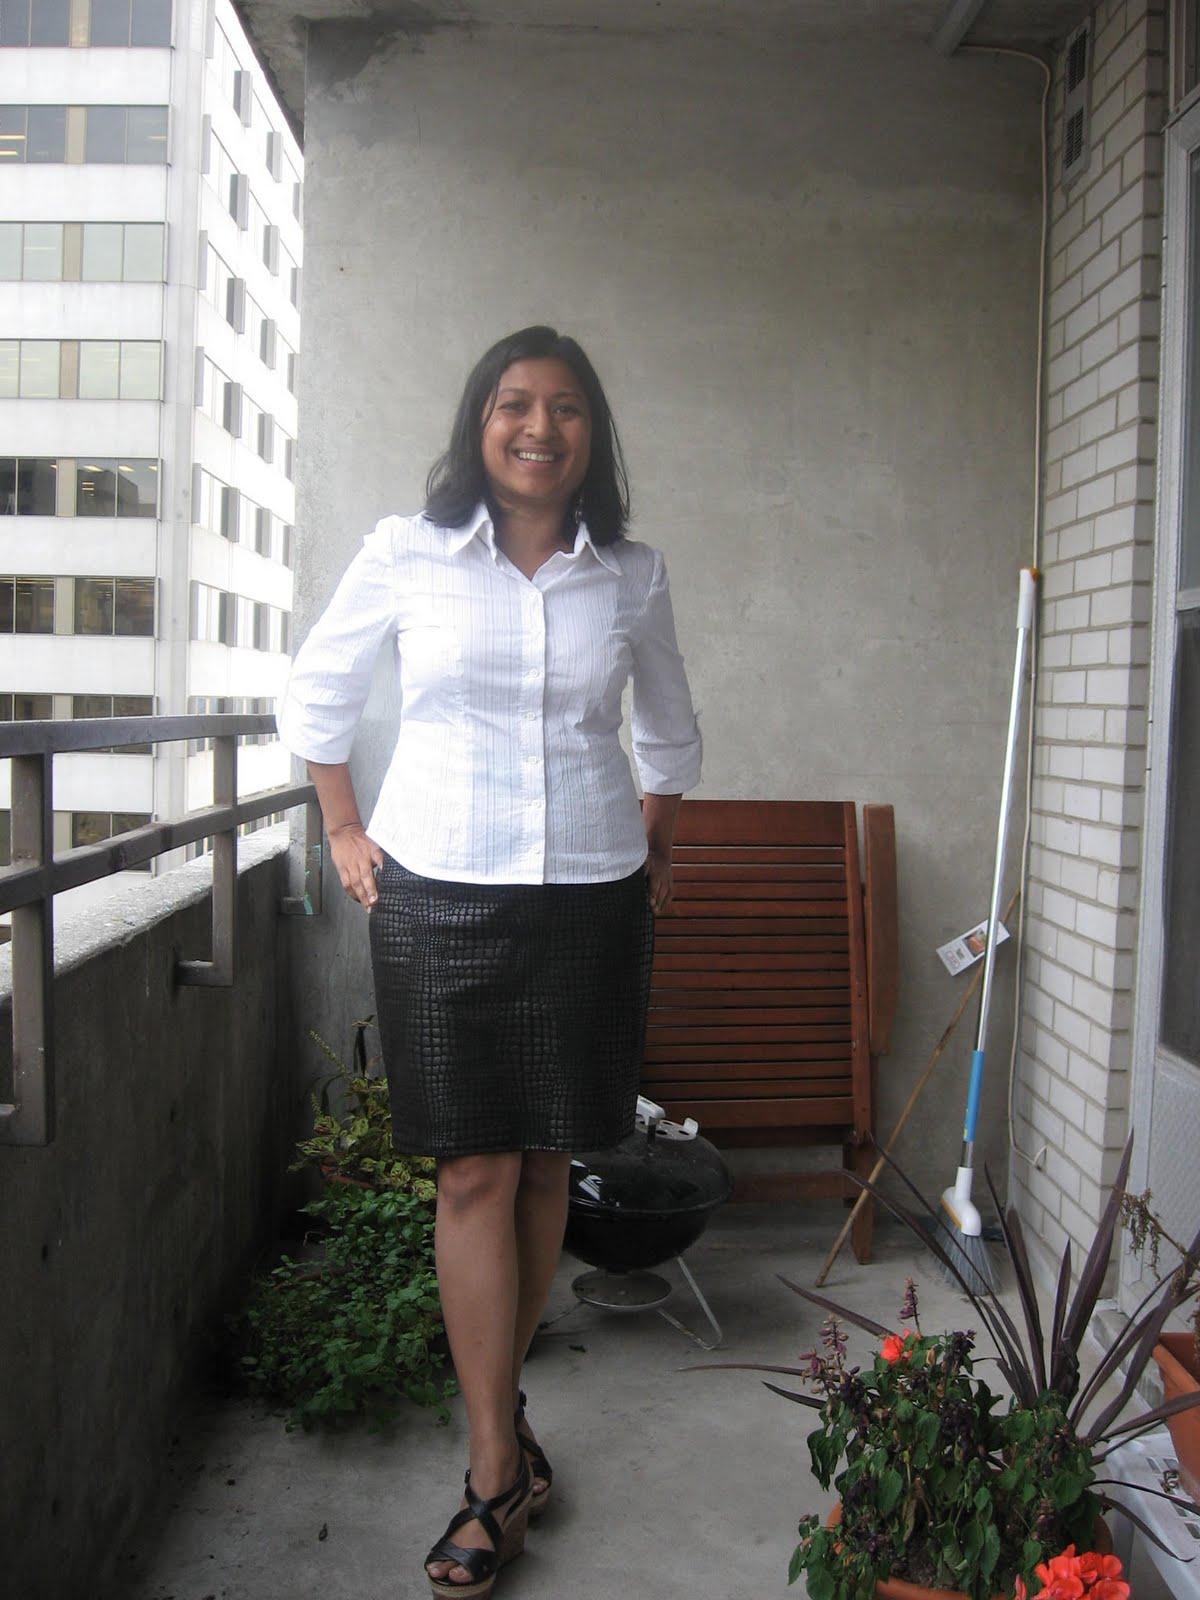 Weekend Crafting White Shirt Black Skirt